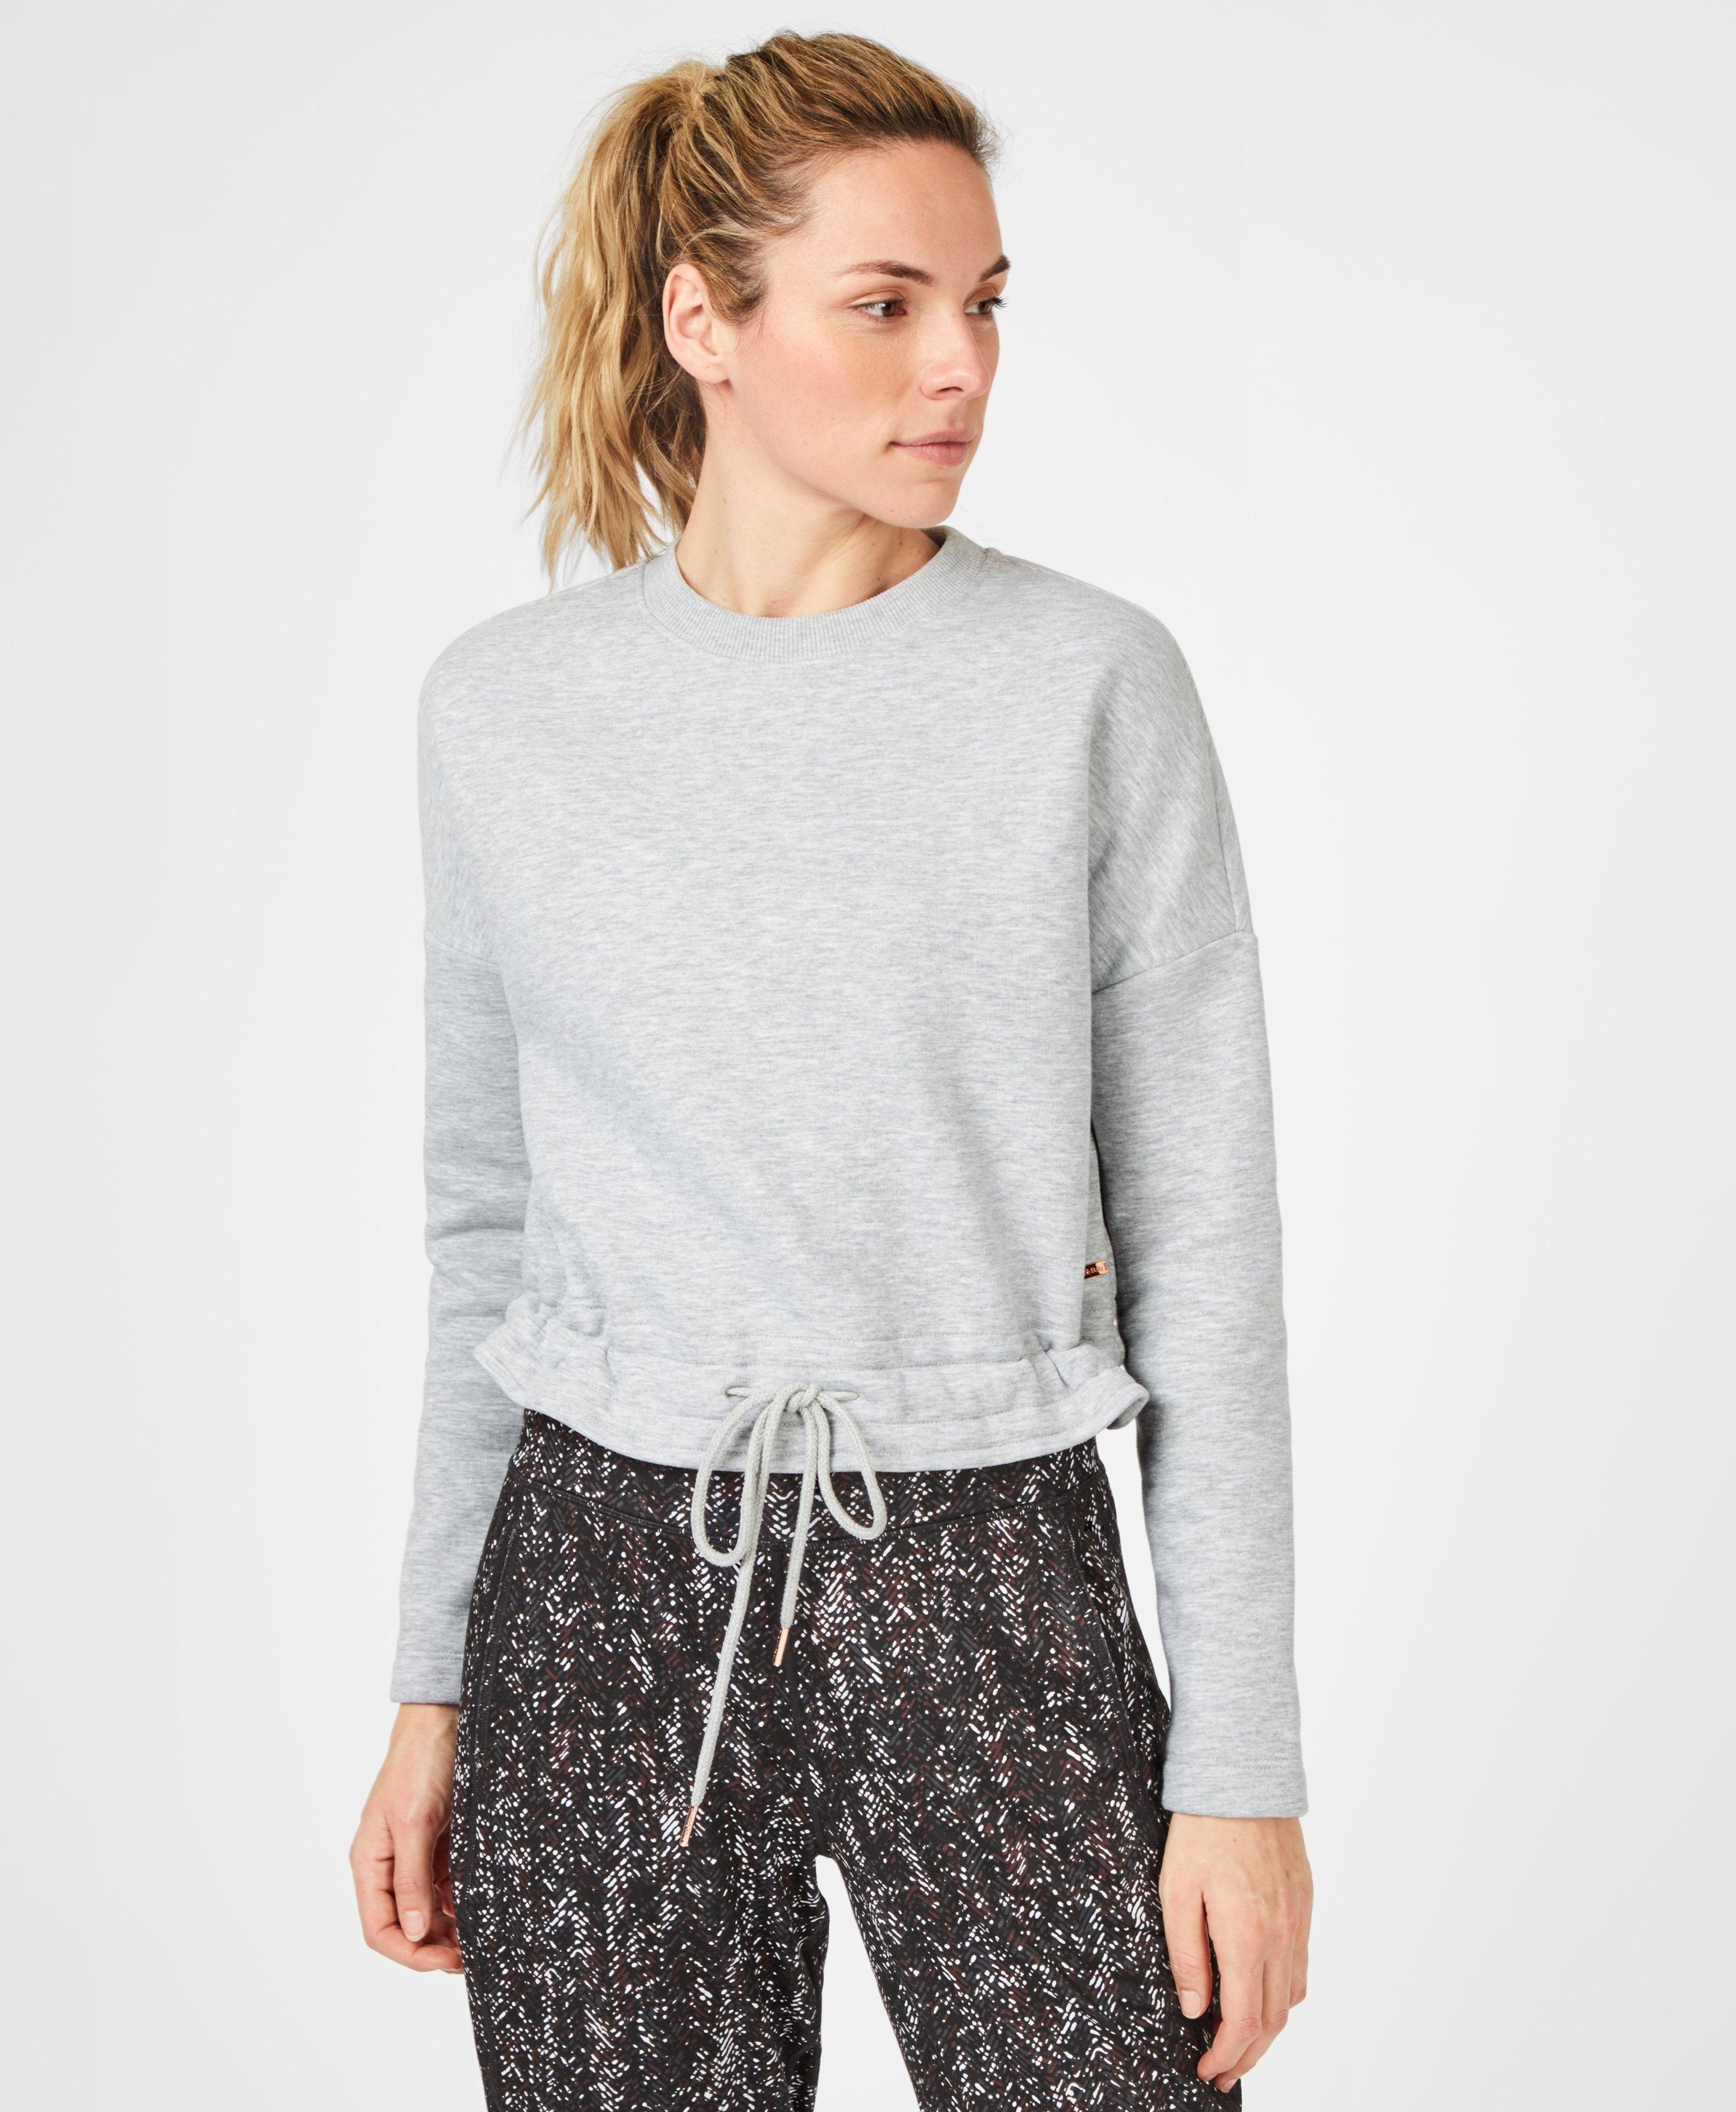 Cosmic Grey Marl Sweatshirt